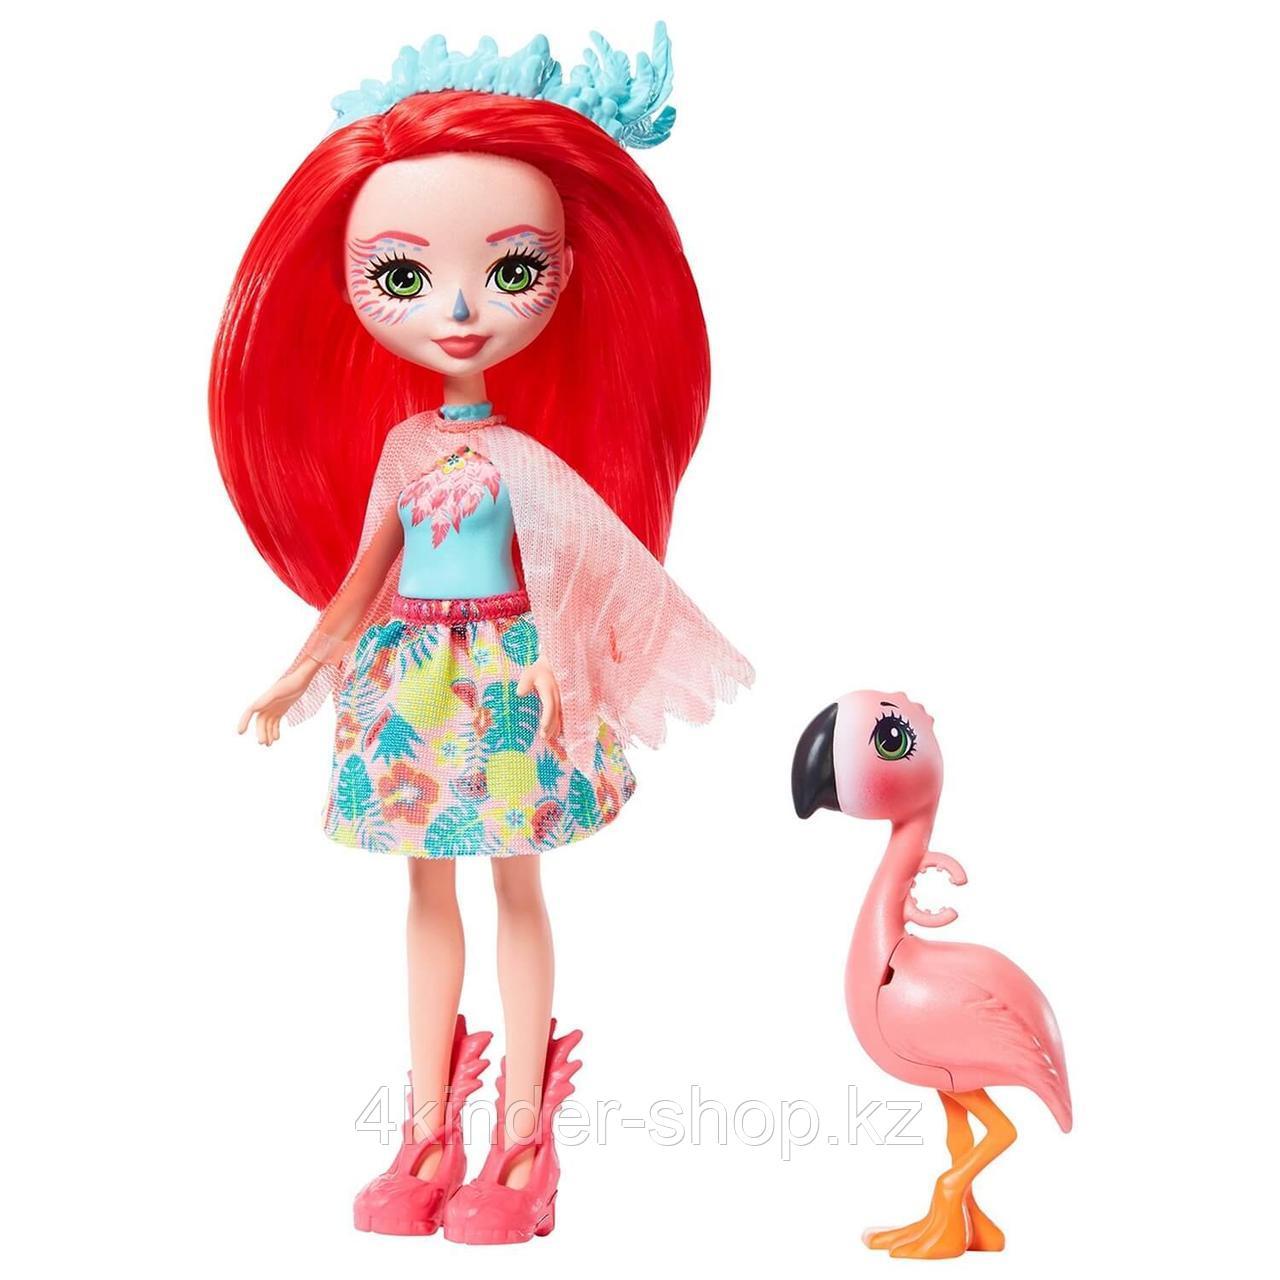 Энчантималс Enchantimals кукла с питомцем Фэнси Флэминг и Свош GFN42 - фото 2